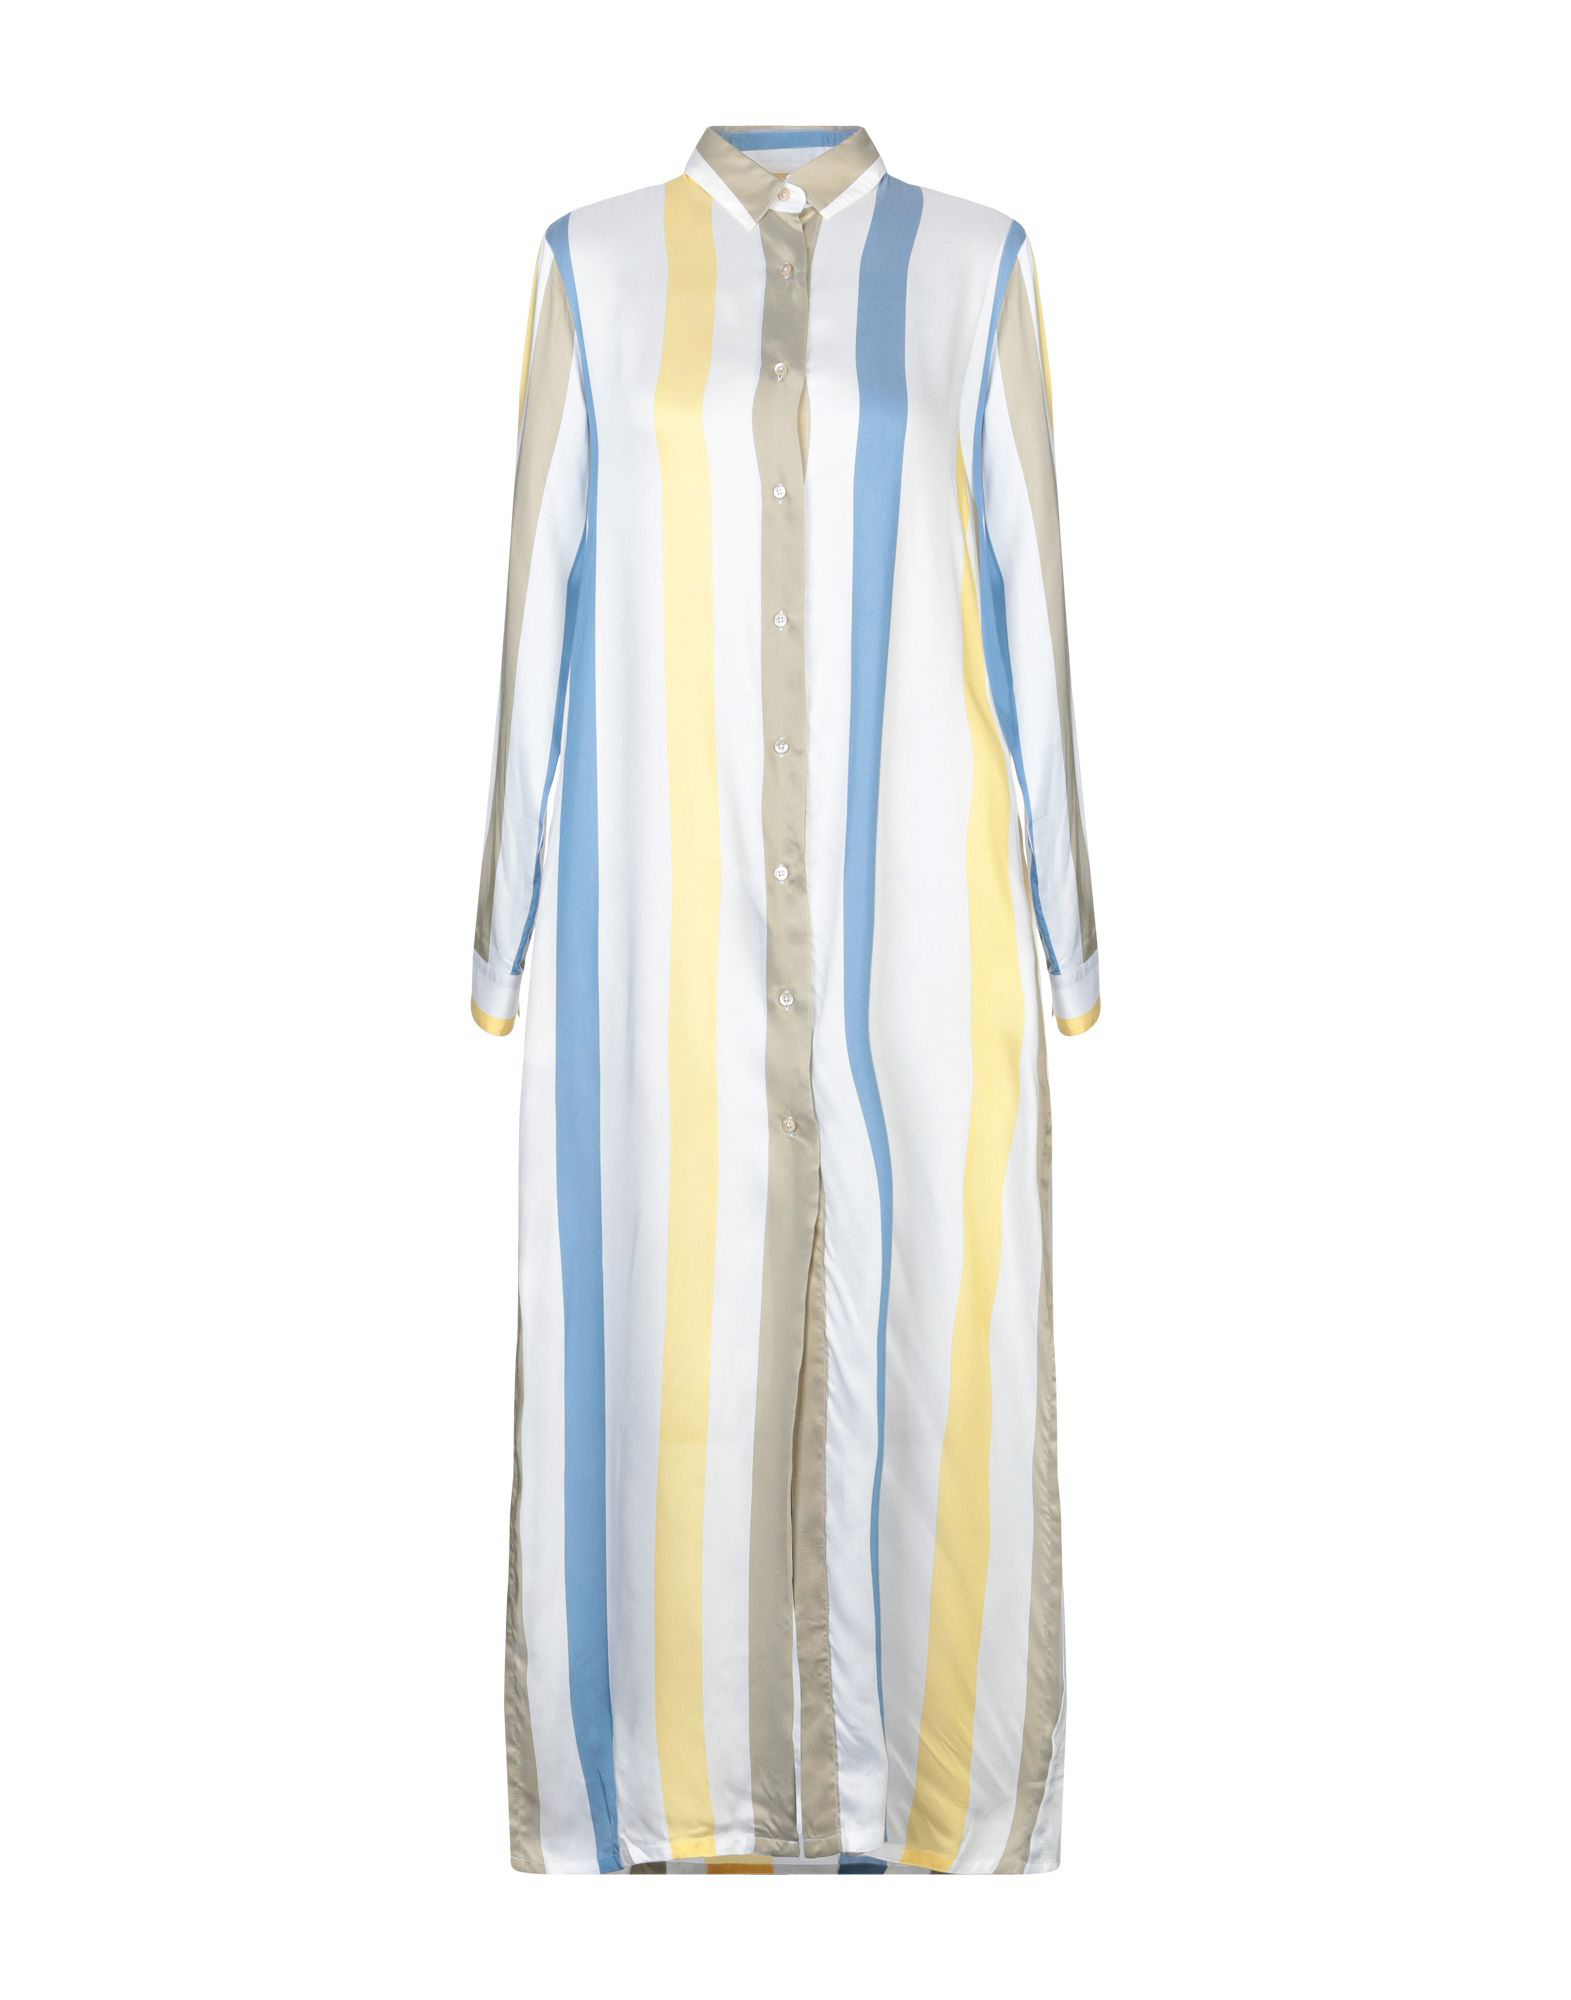 6122d5b53409 Xacus 3 4 Length Dresses In Ivory